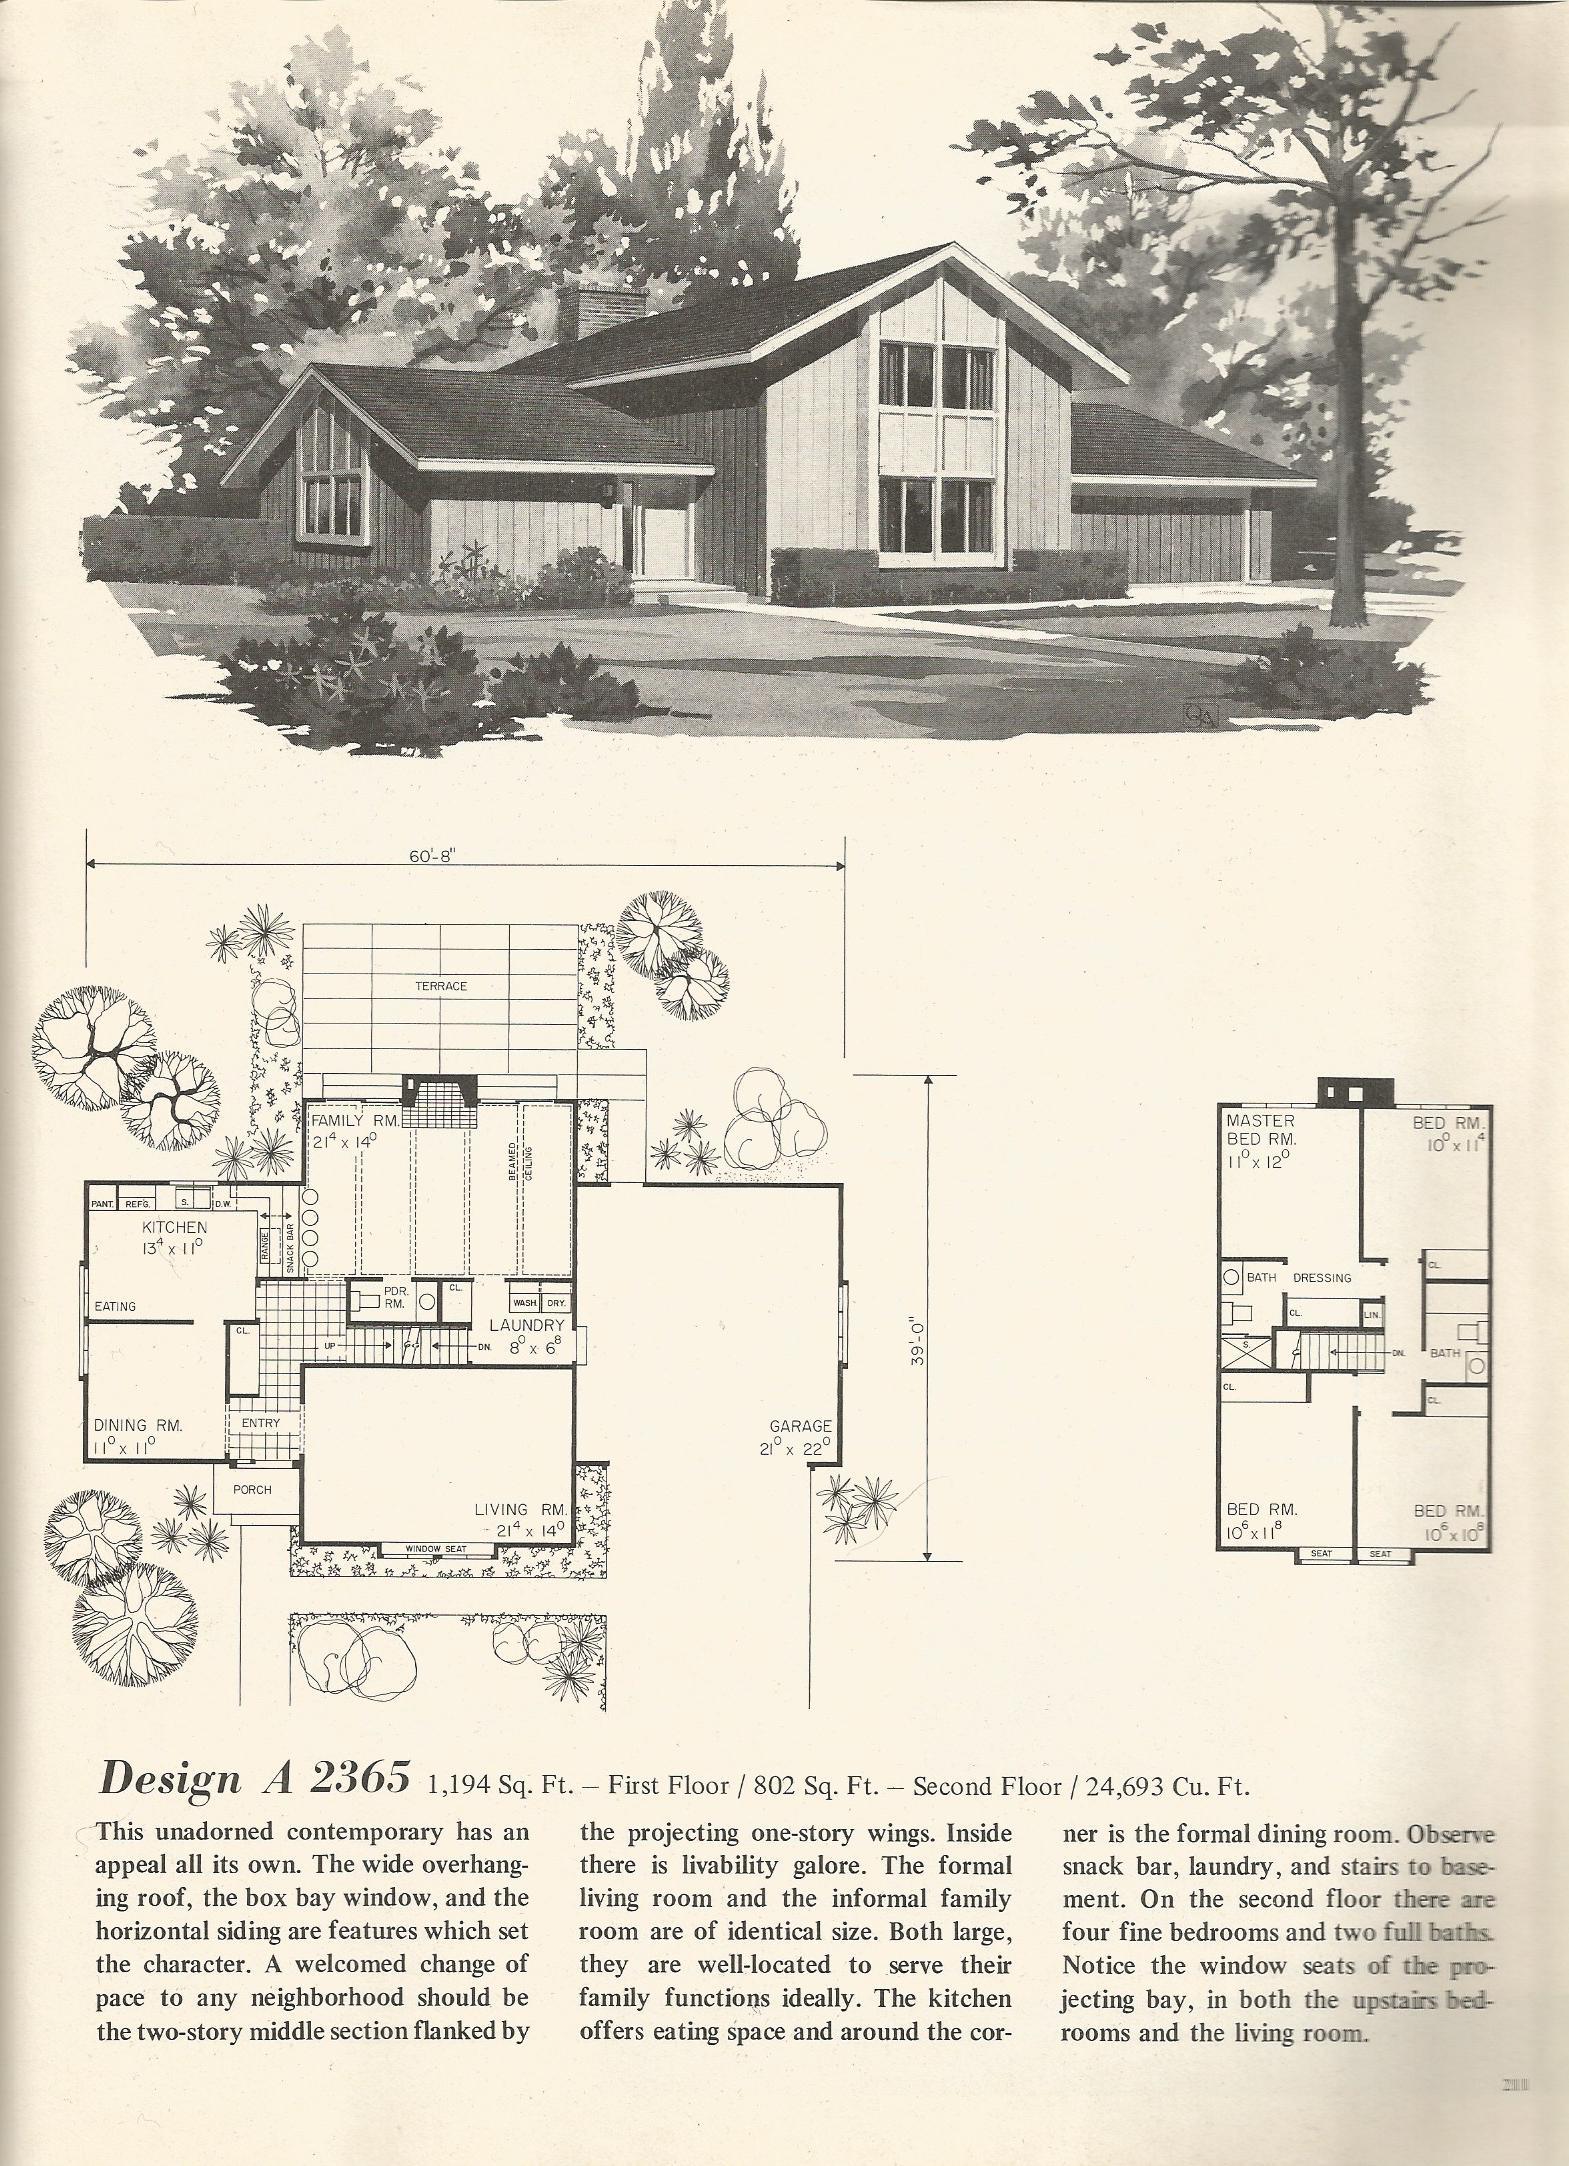 Vintage house plans 2365 antique alter ego for Retro home designs